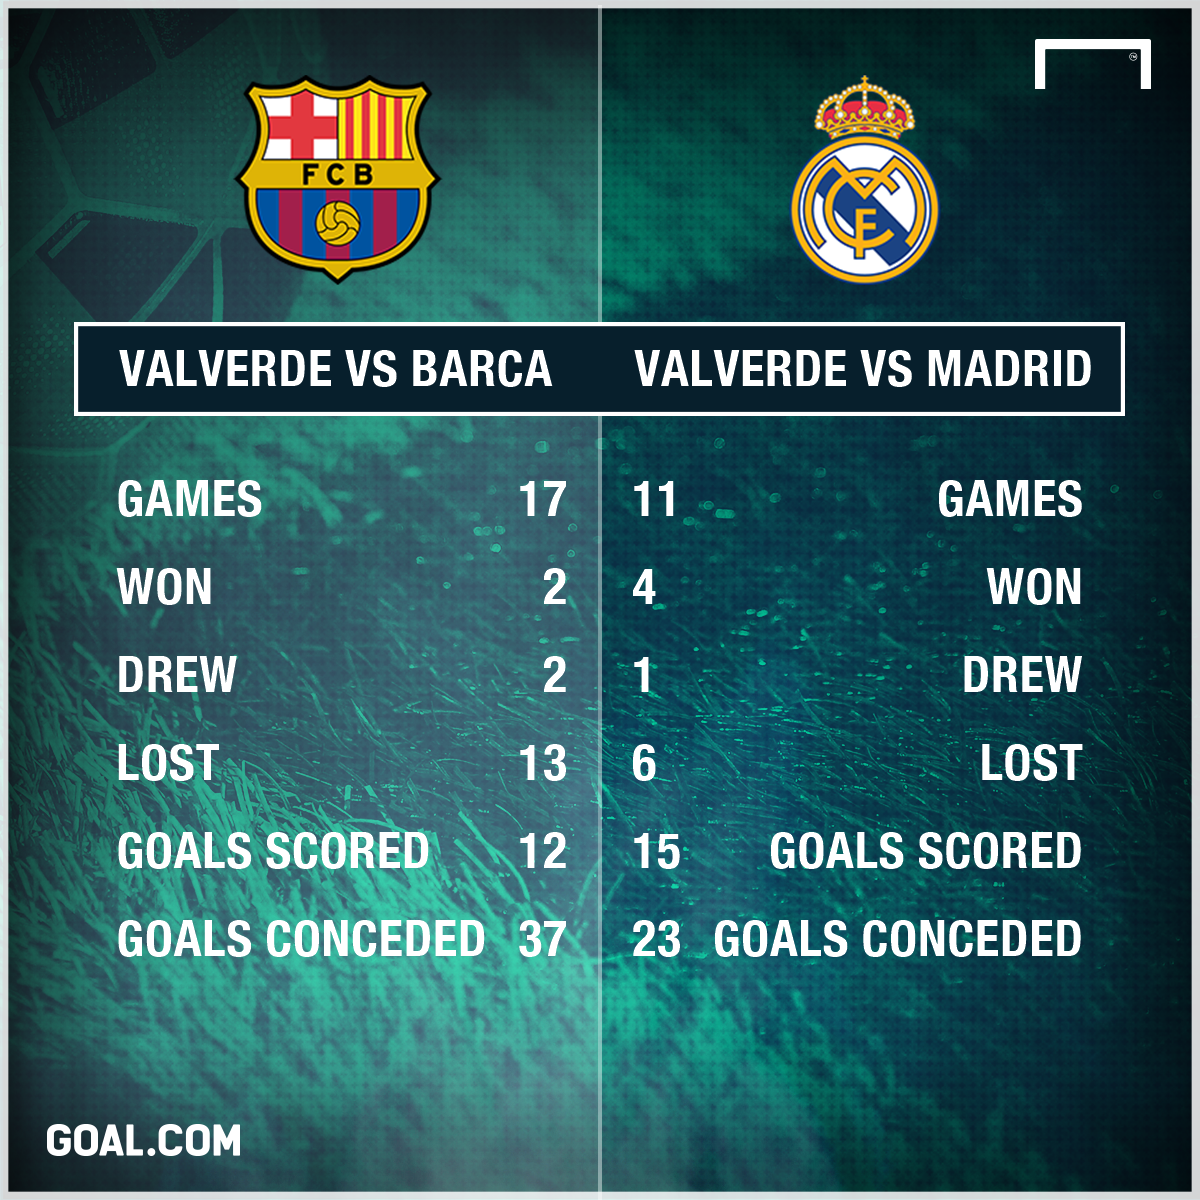 Valverde PS